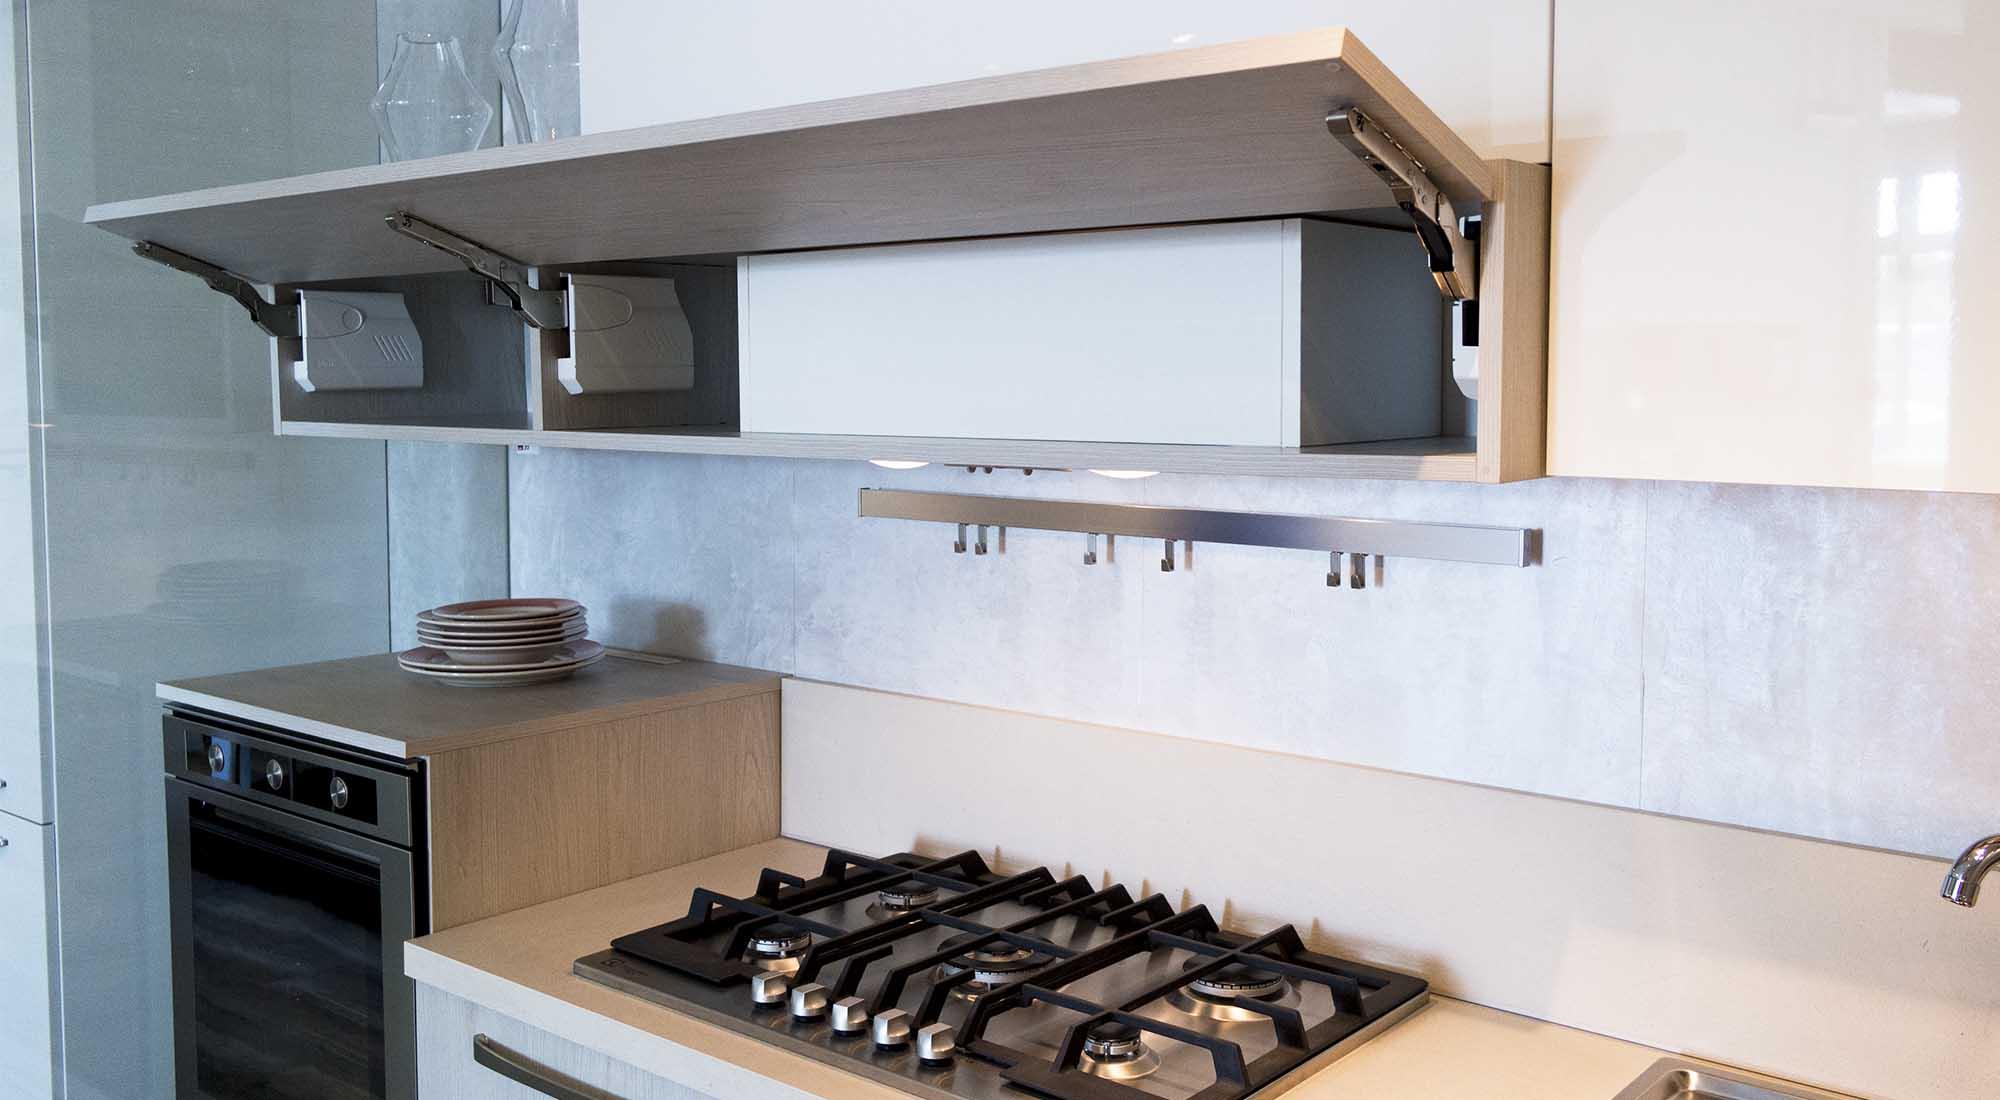 Cucina con basi sabbia e pensili bianco lucido cucine padova - Larghezza pensili cucina ...